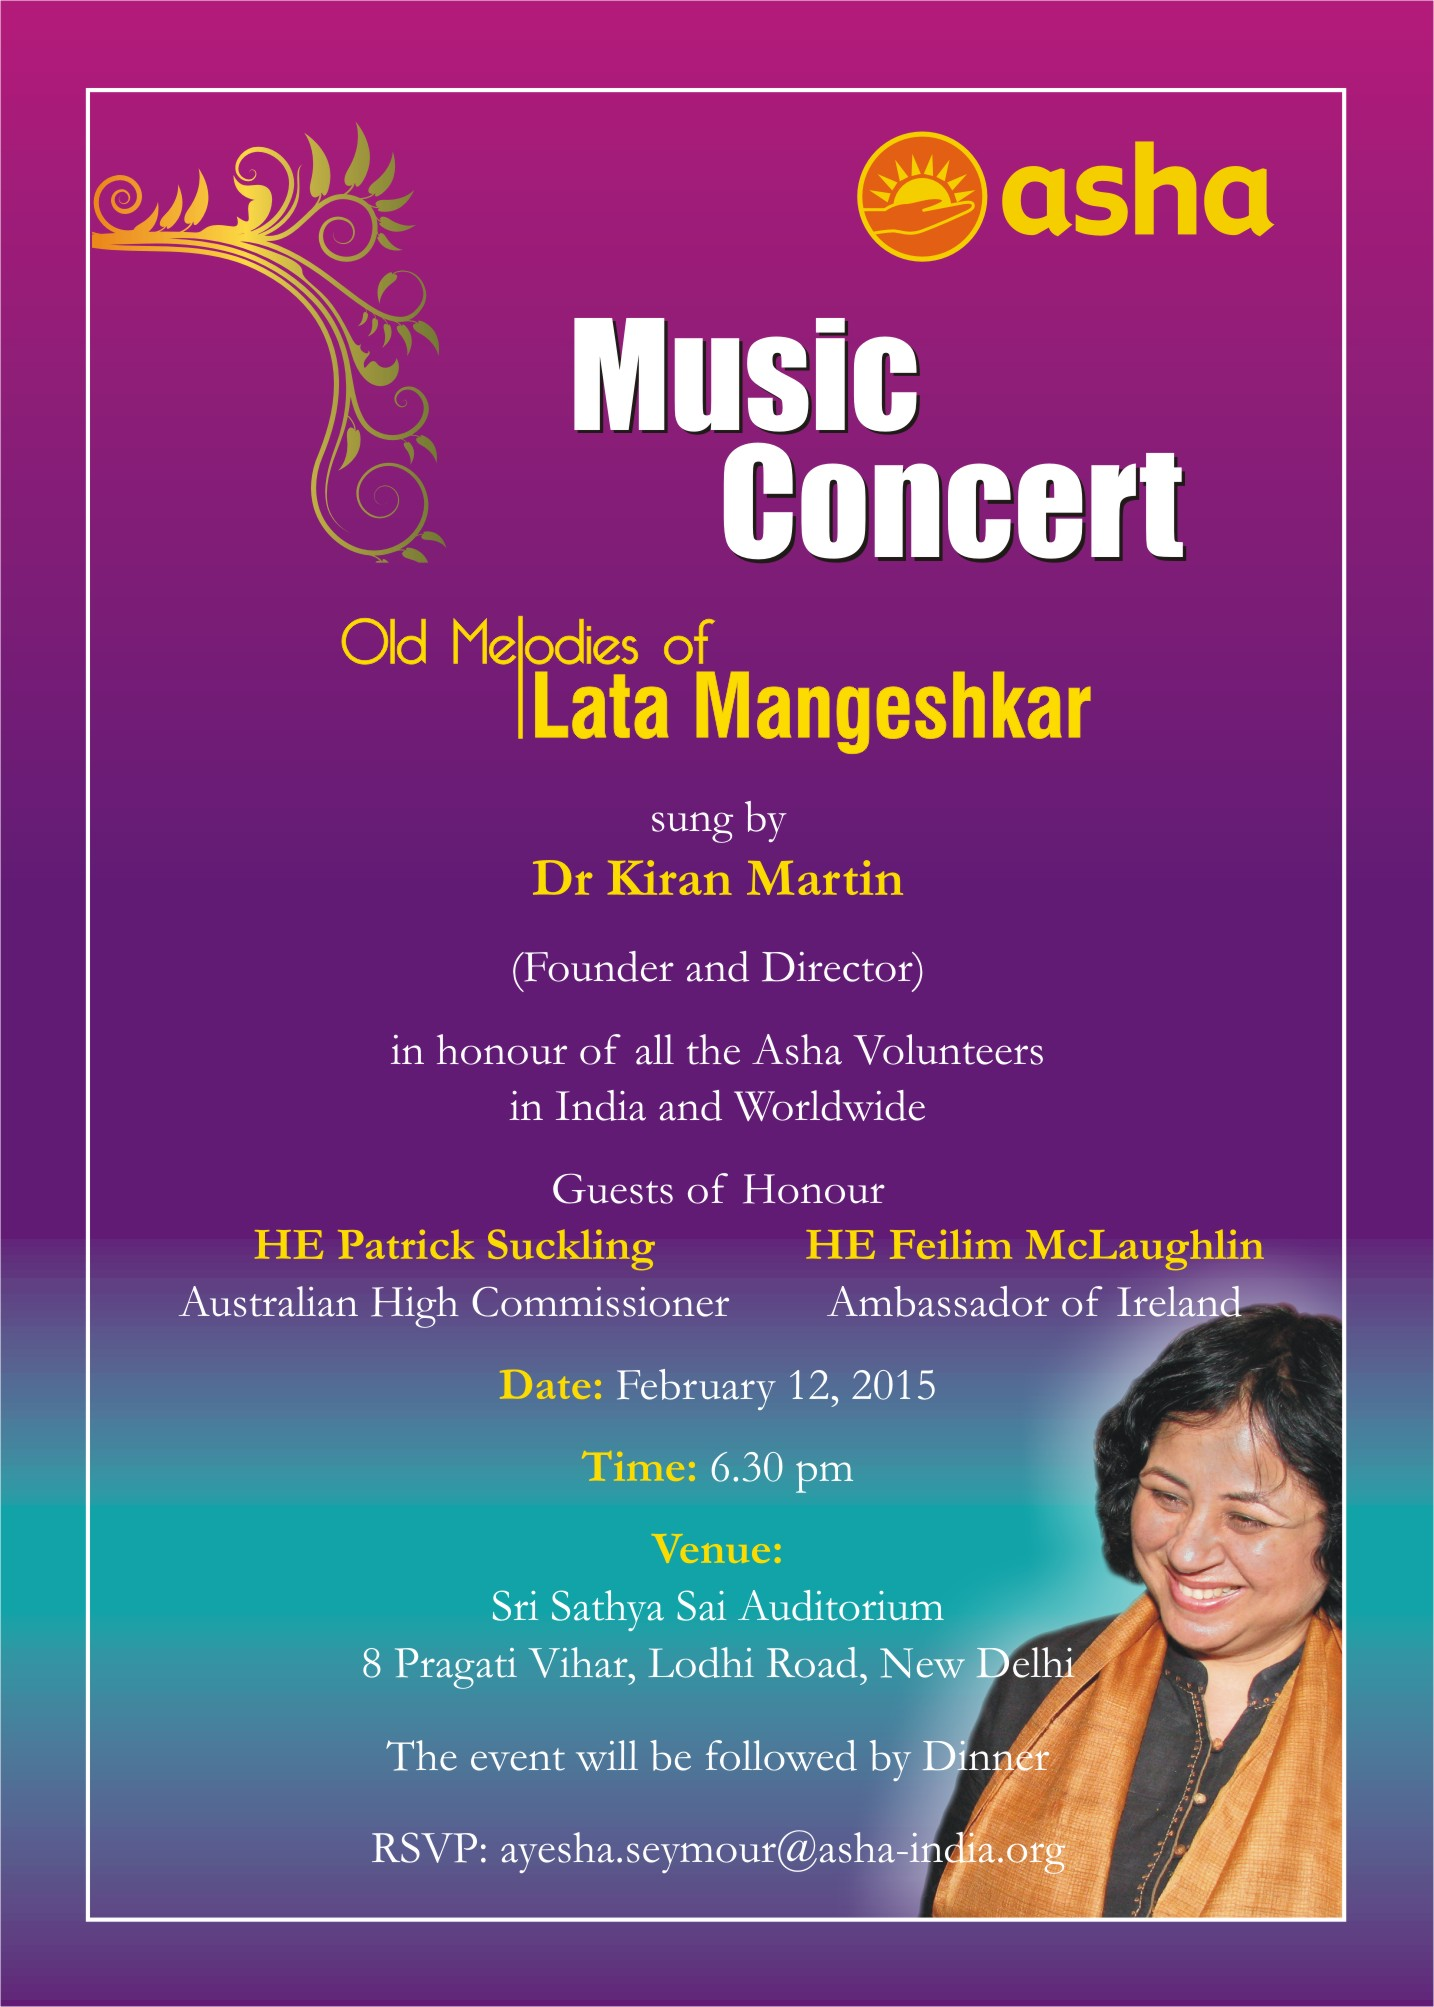 Music Concert by Dr Kiran